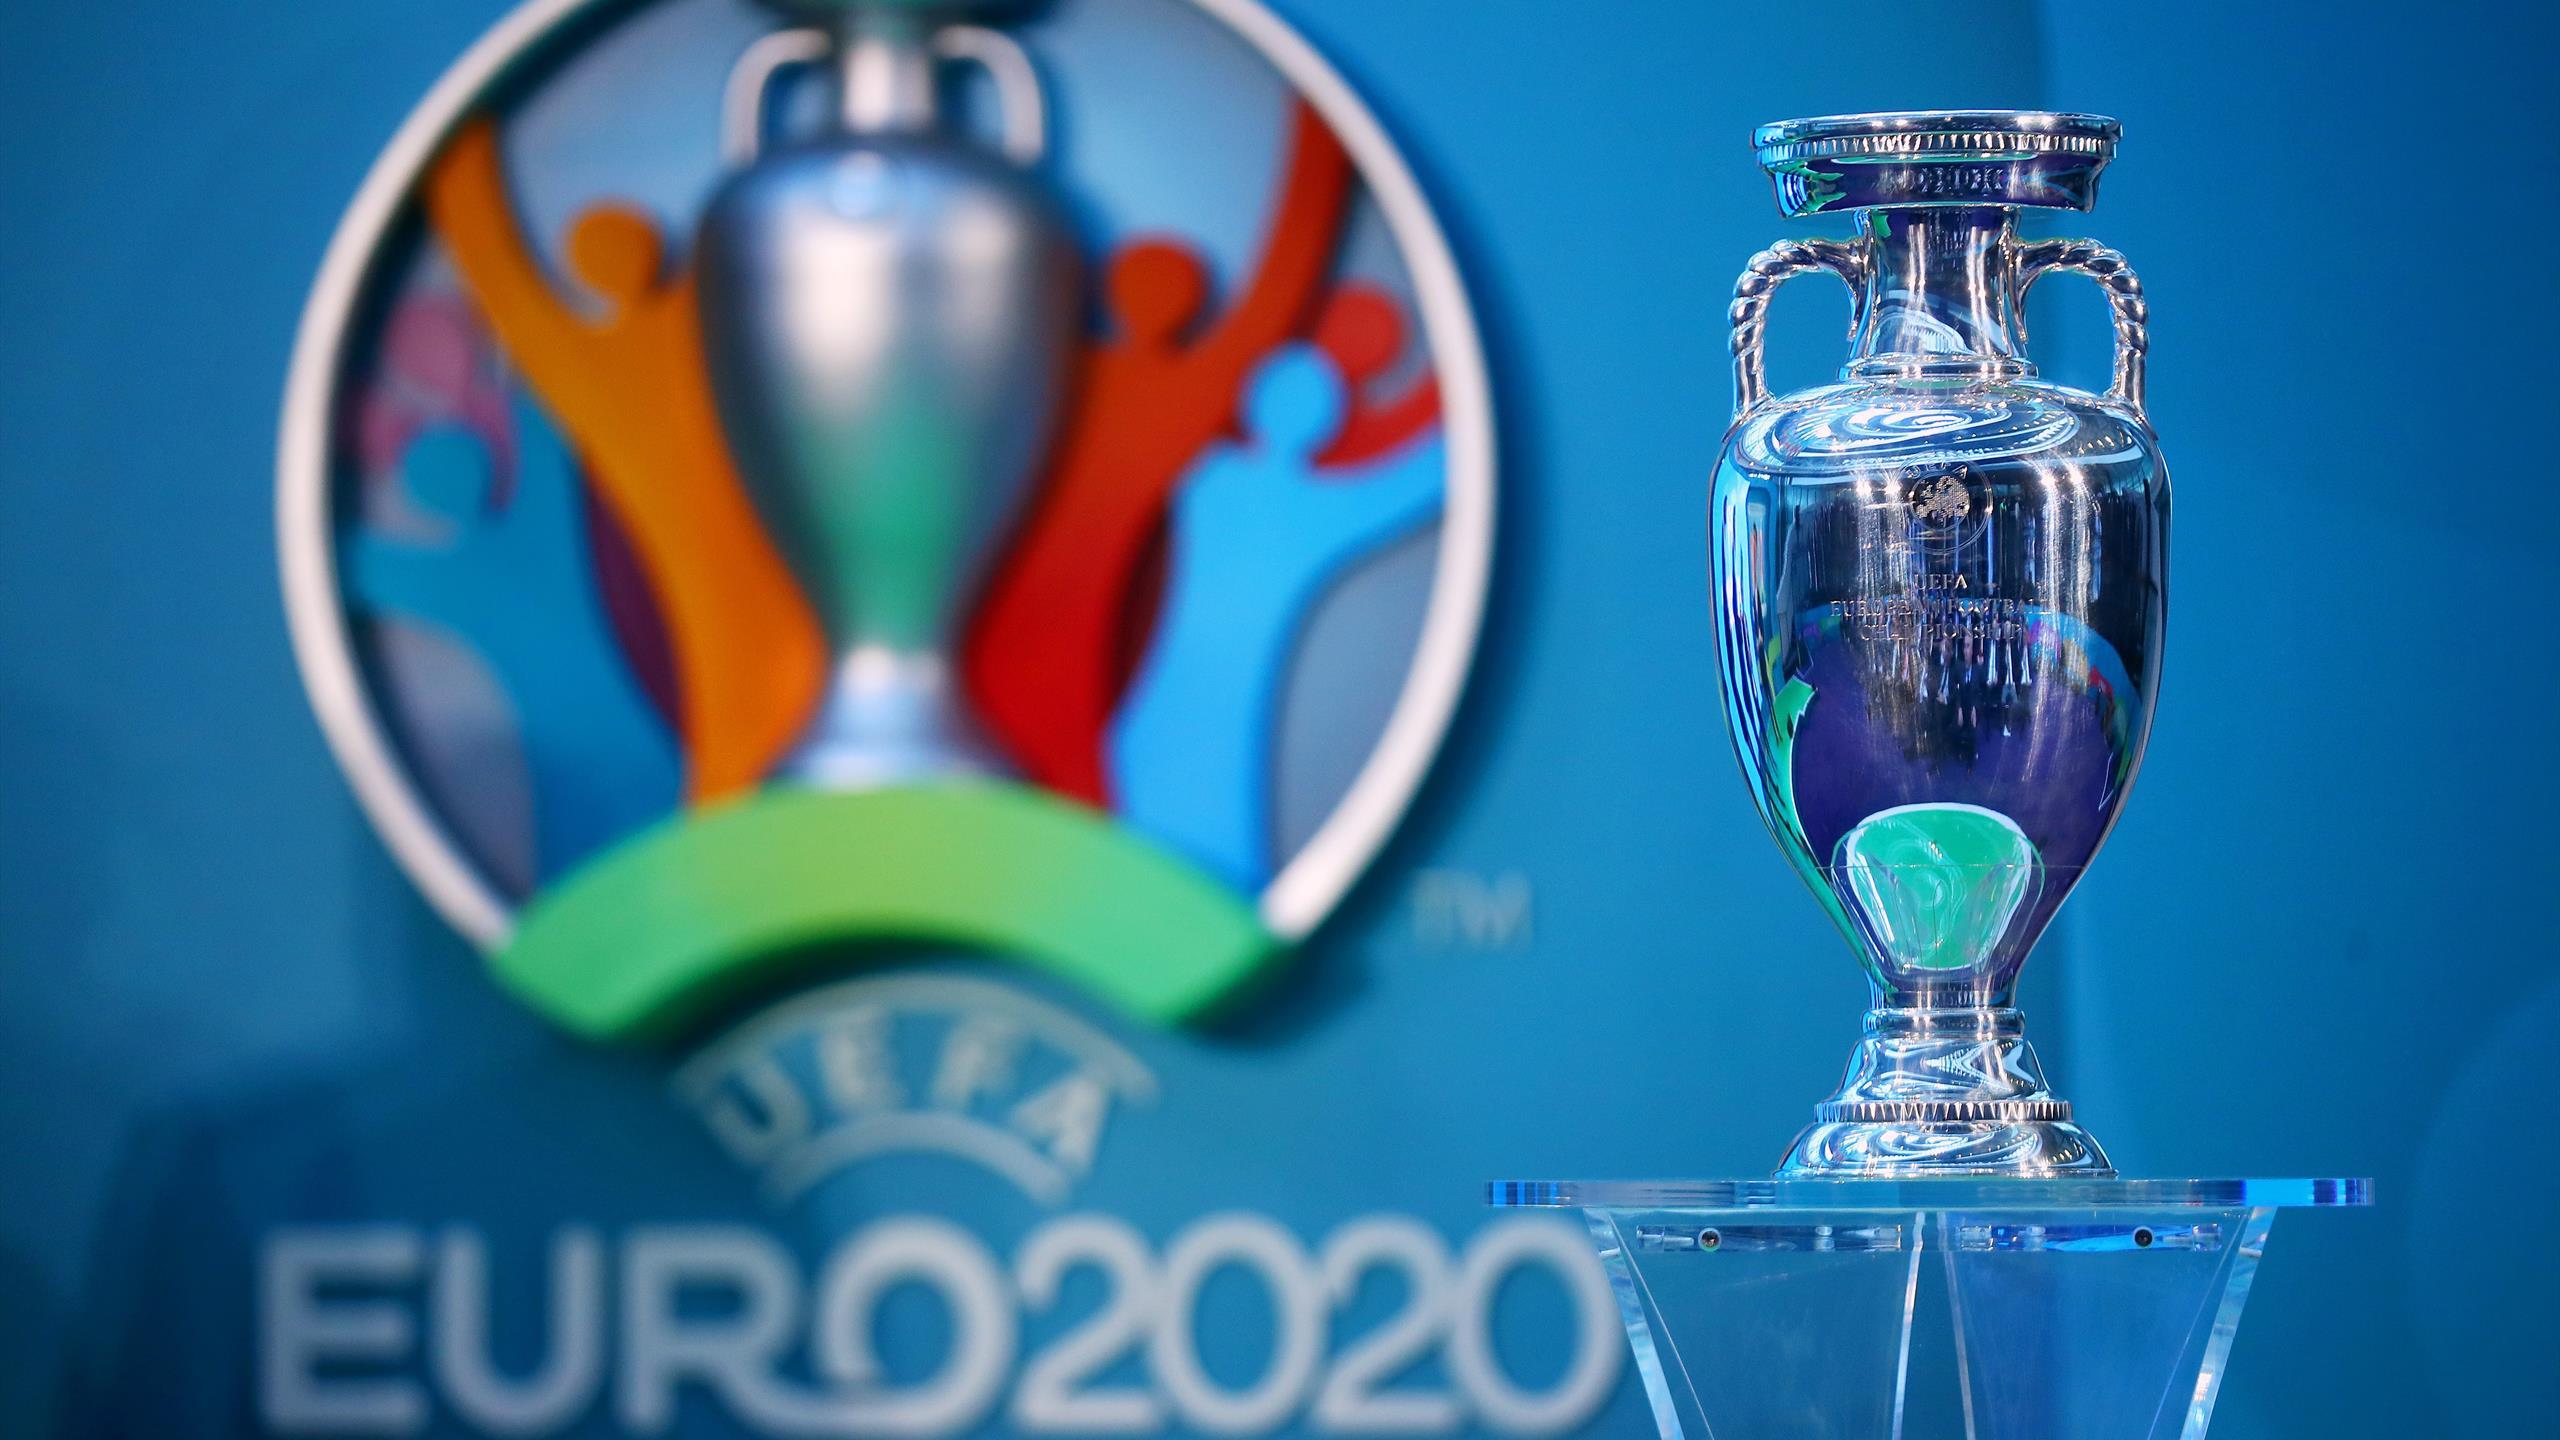 Football news - UEFA confirm Euro 2020 postponed until 2021 ...